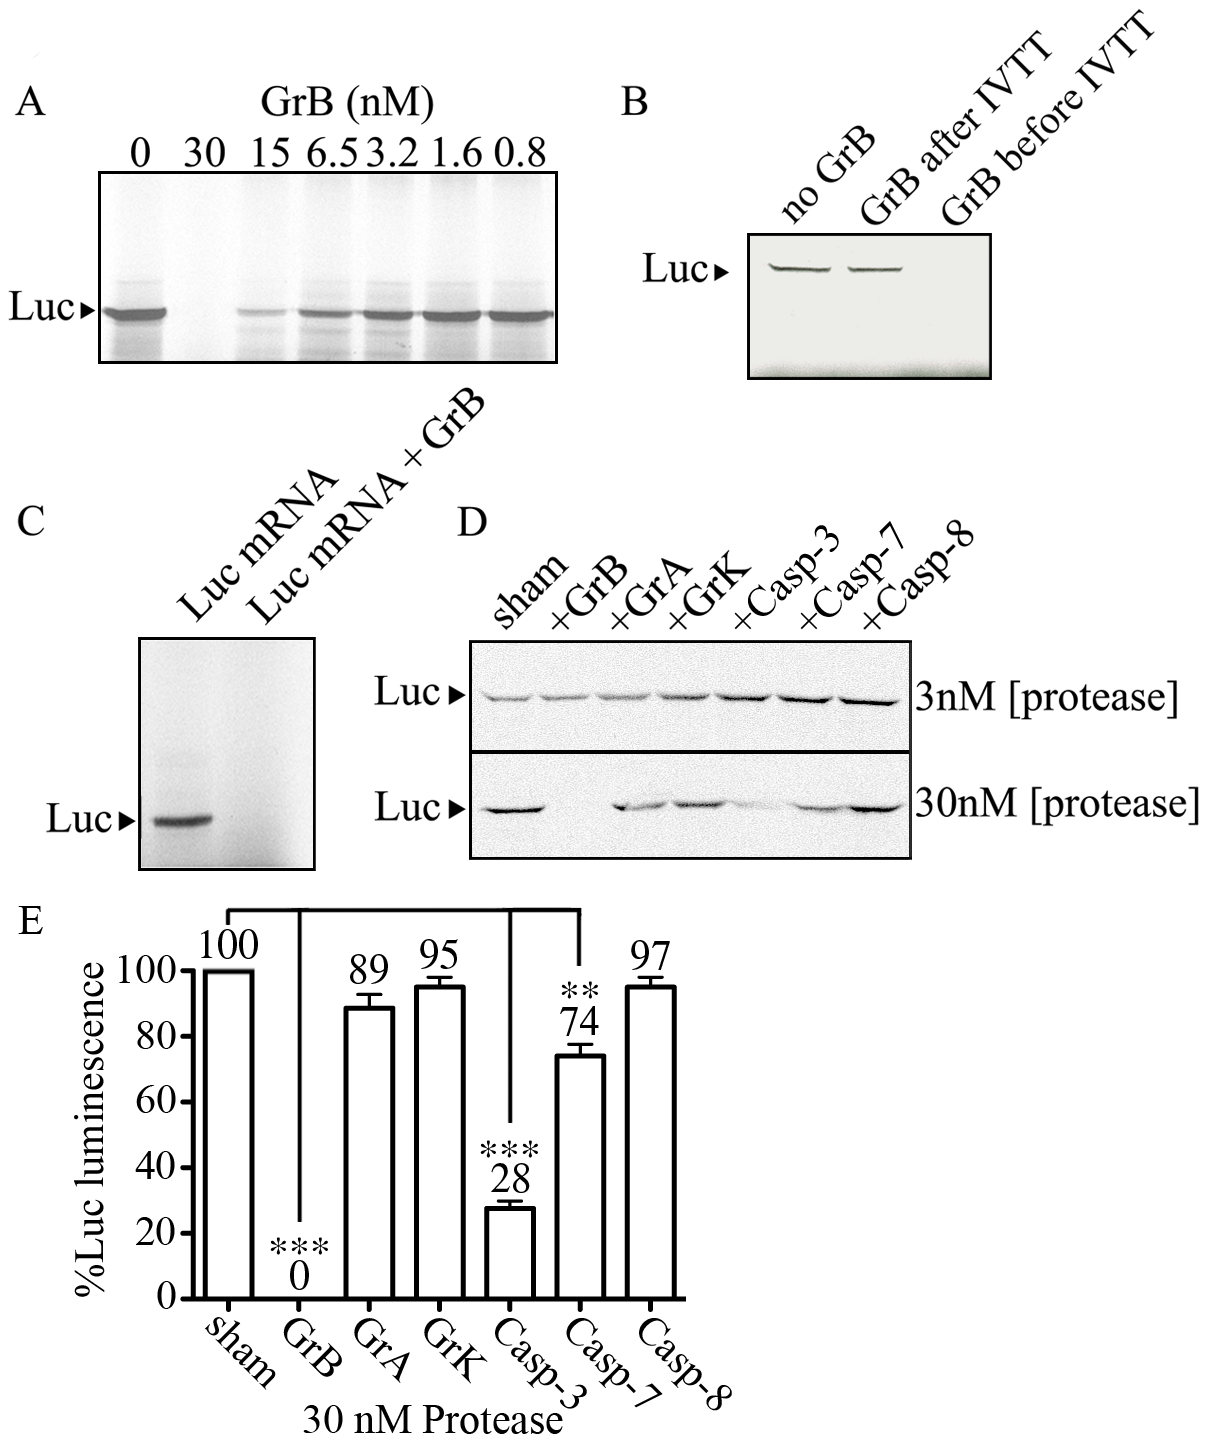 GrB inhibits <i>in vitro</i> translation of Luc.